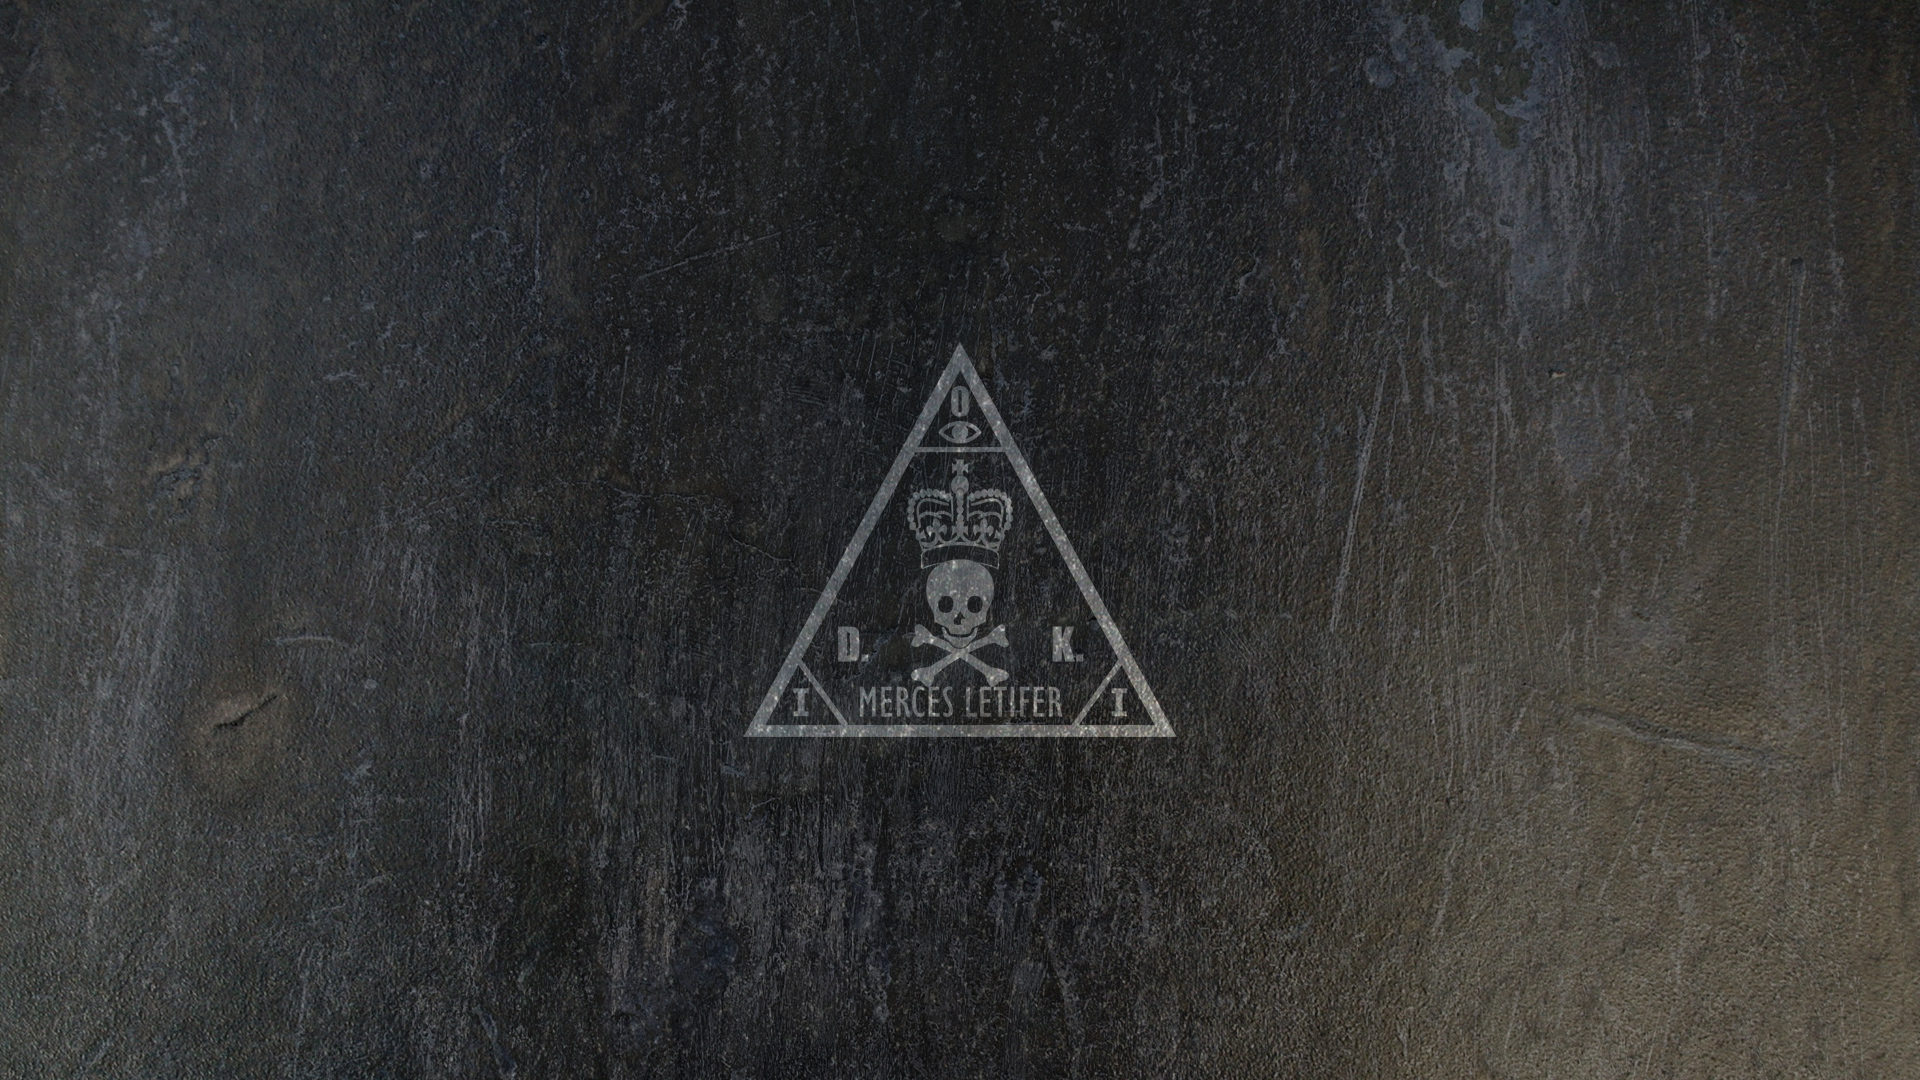 1600dhitman agency logo wallpaper  metal  by bryssis d52w8kcjpg 1920x1080